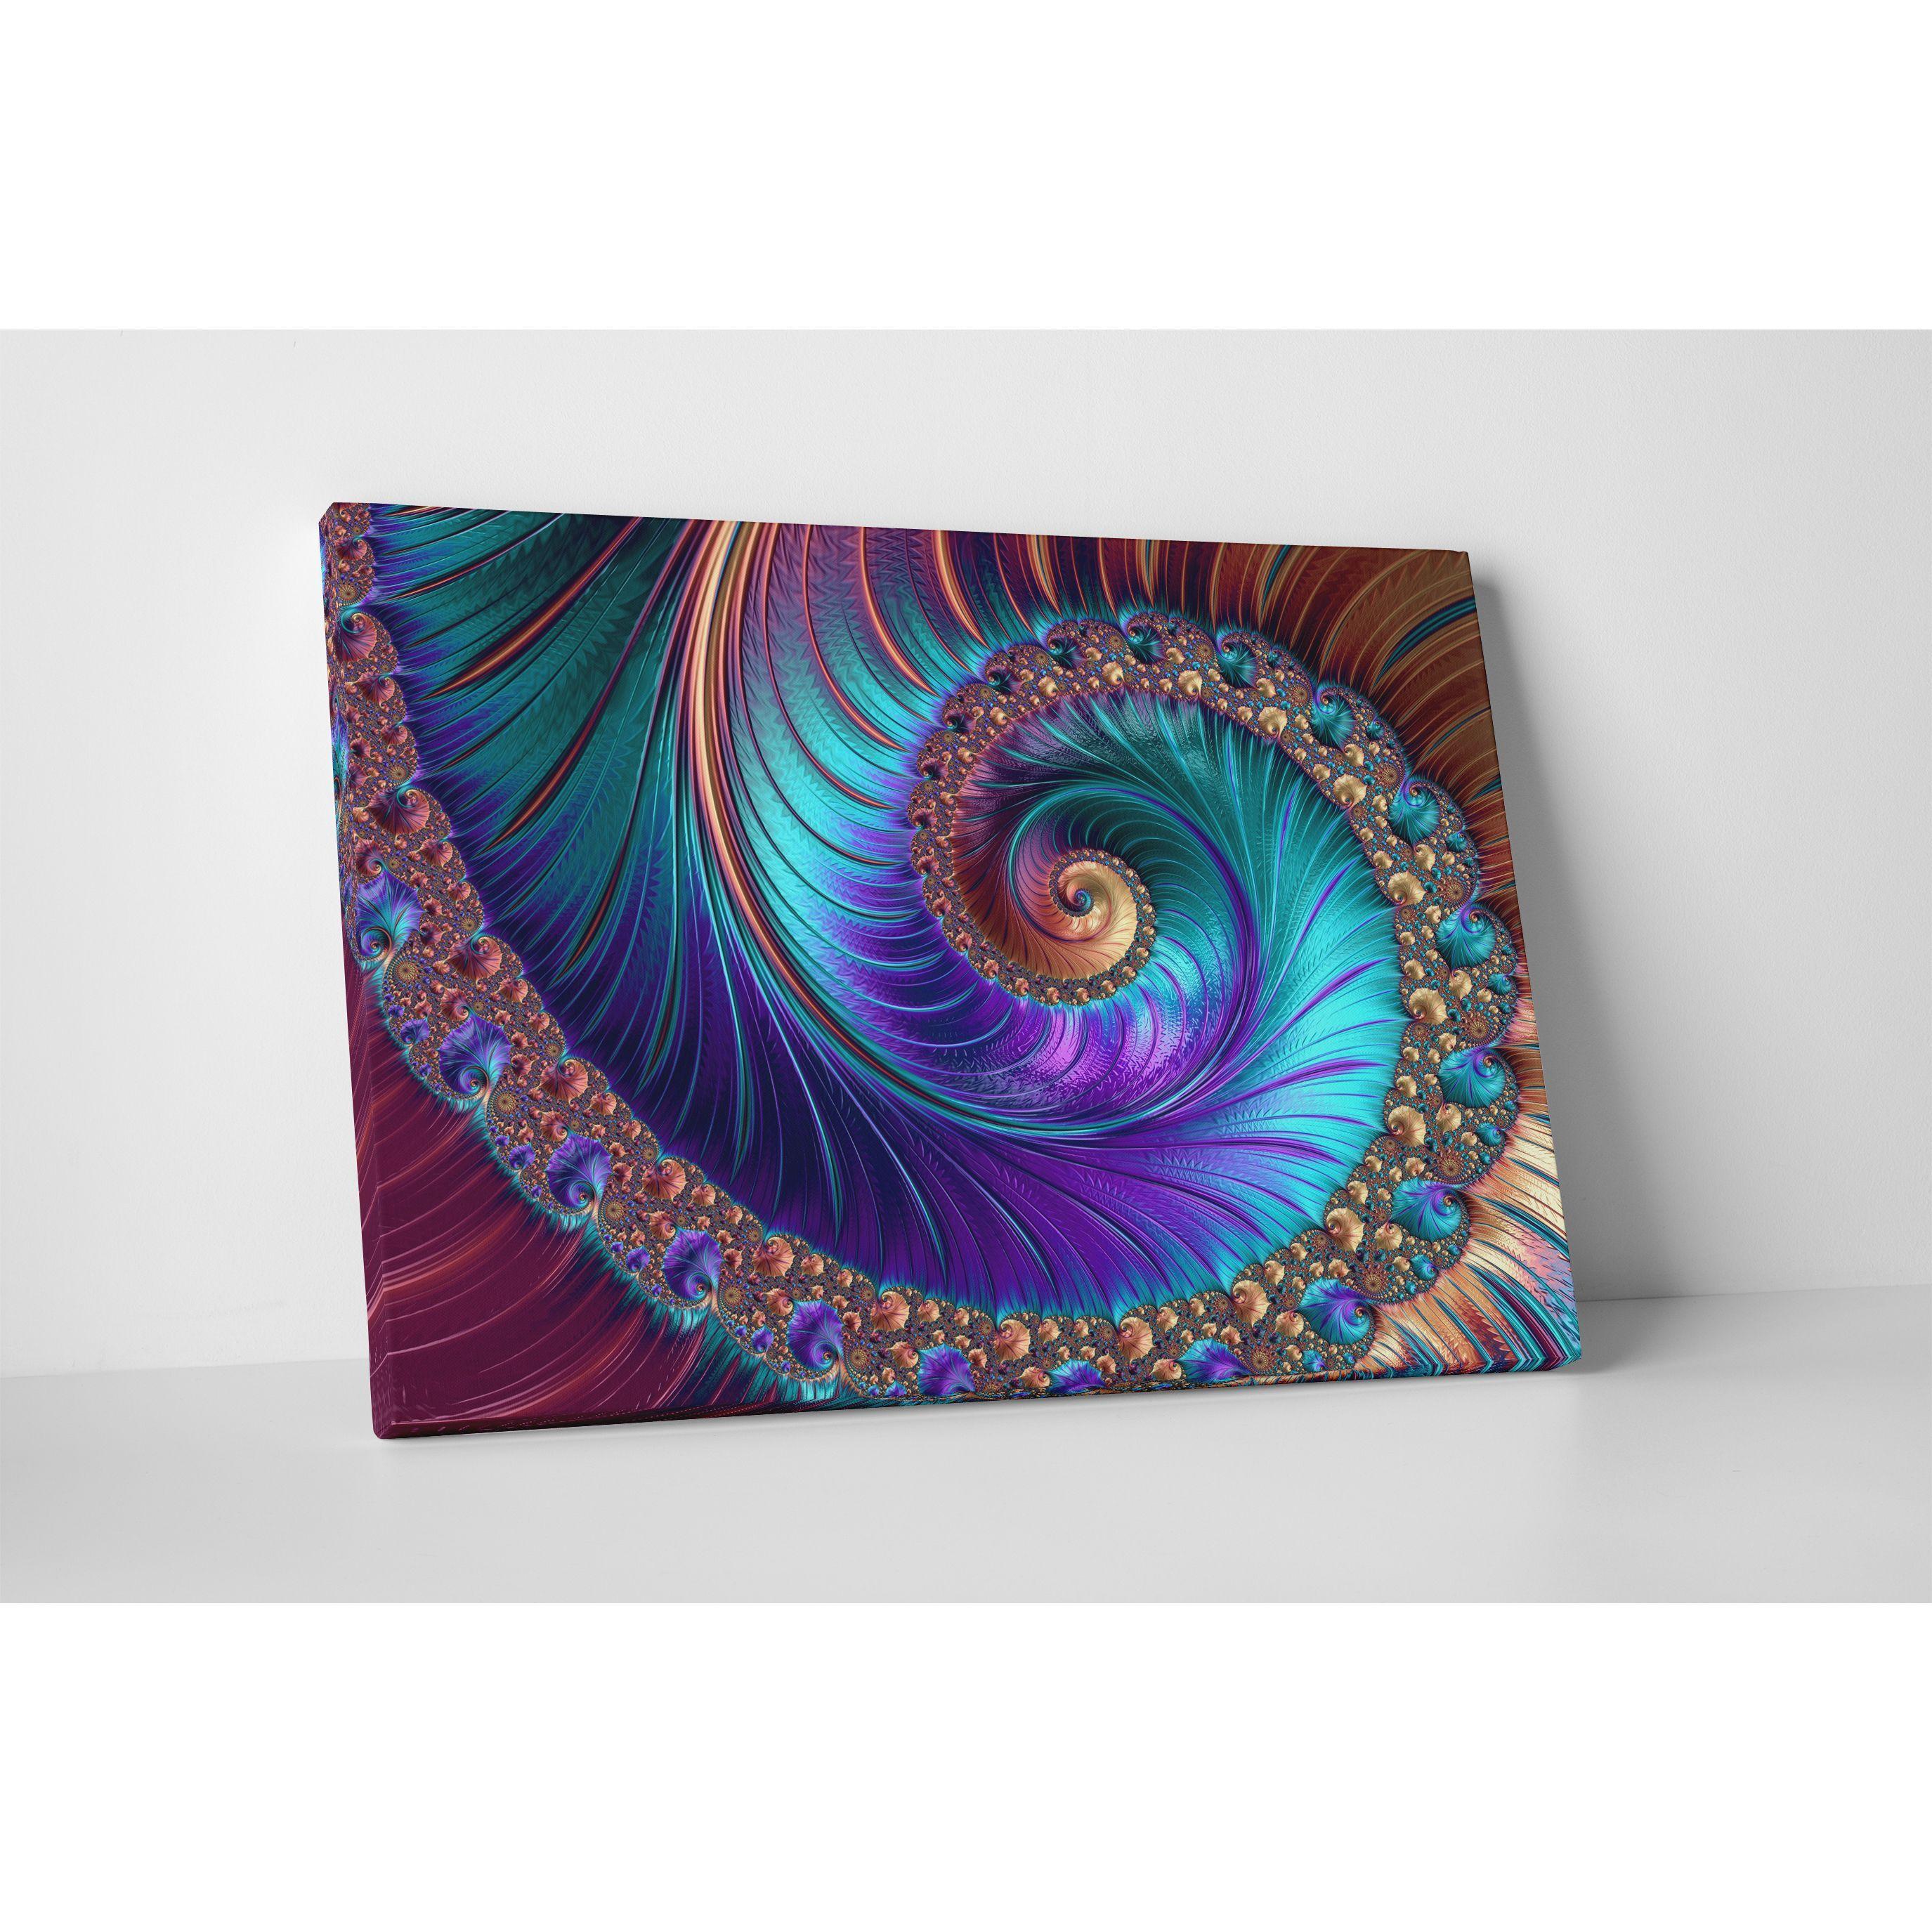 Peacockesk spiralu gallerywrapped abstract canvas wall art